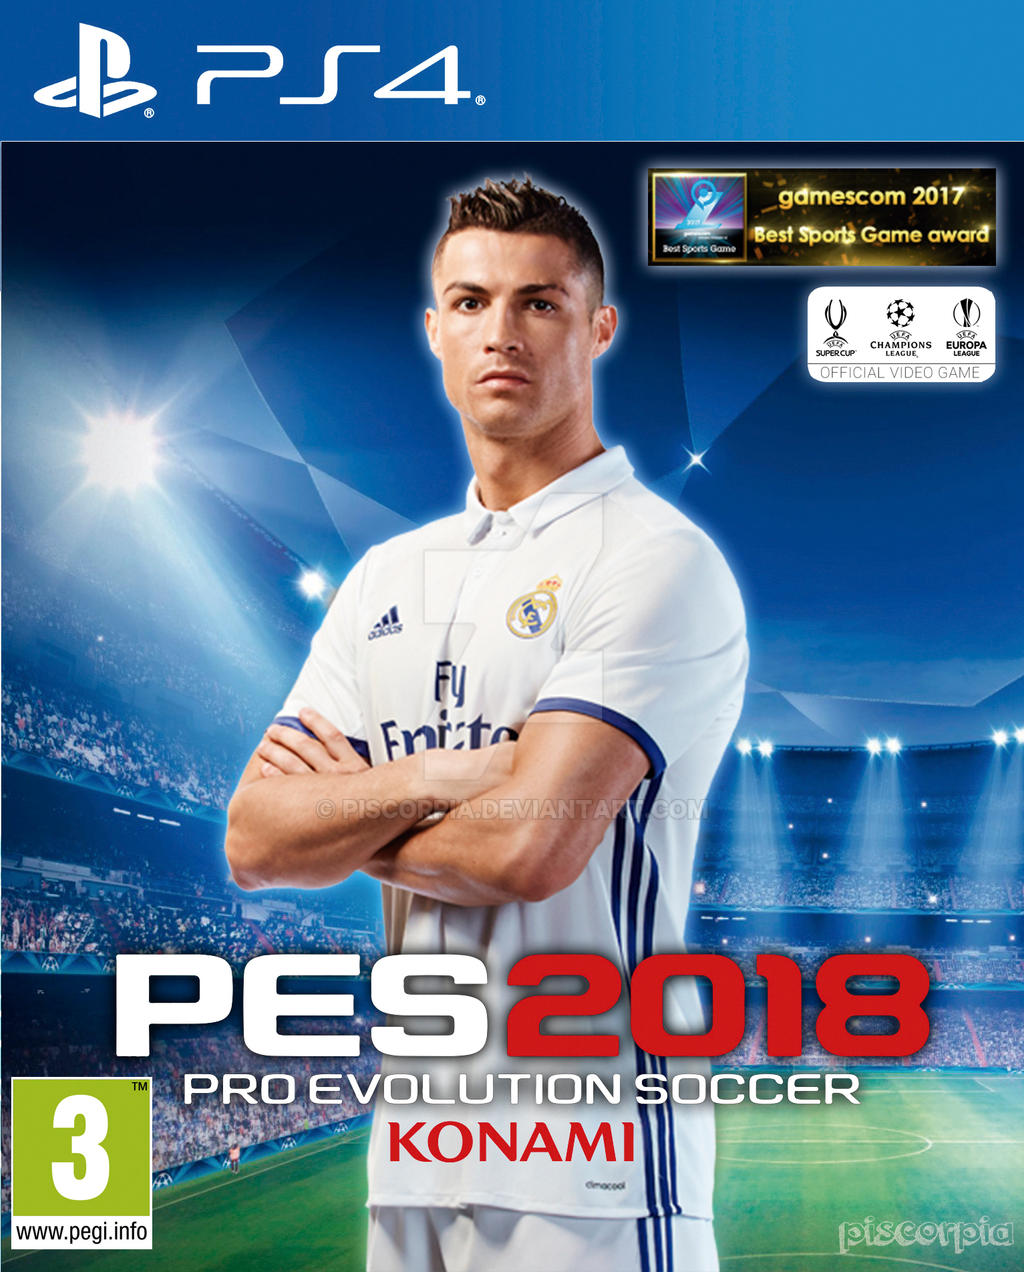 Pes 2018 Cover Real Madrid Cristiano Ronaldo 2 by piscorpia